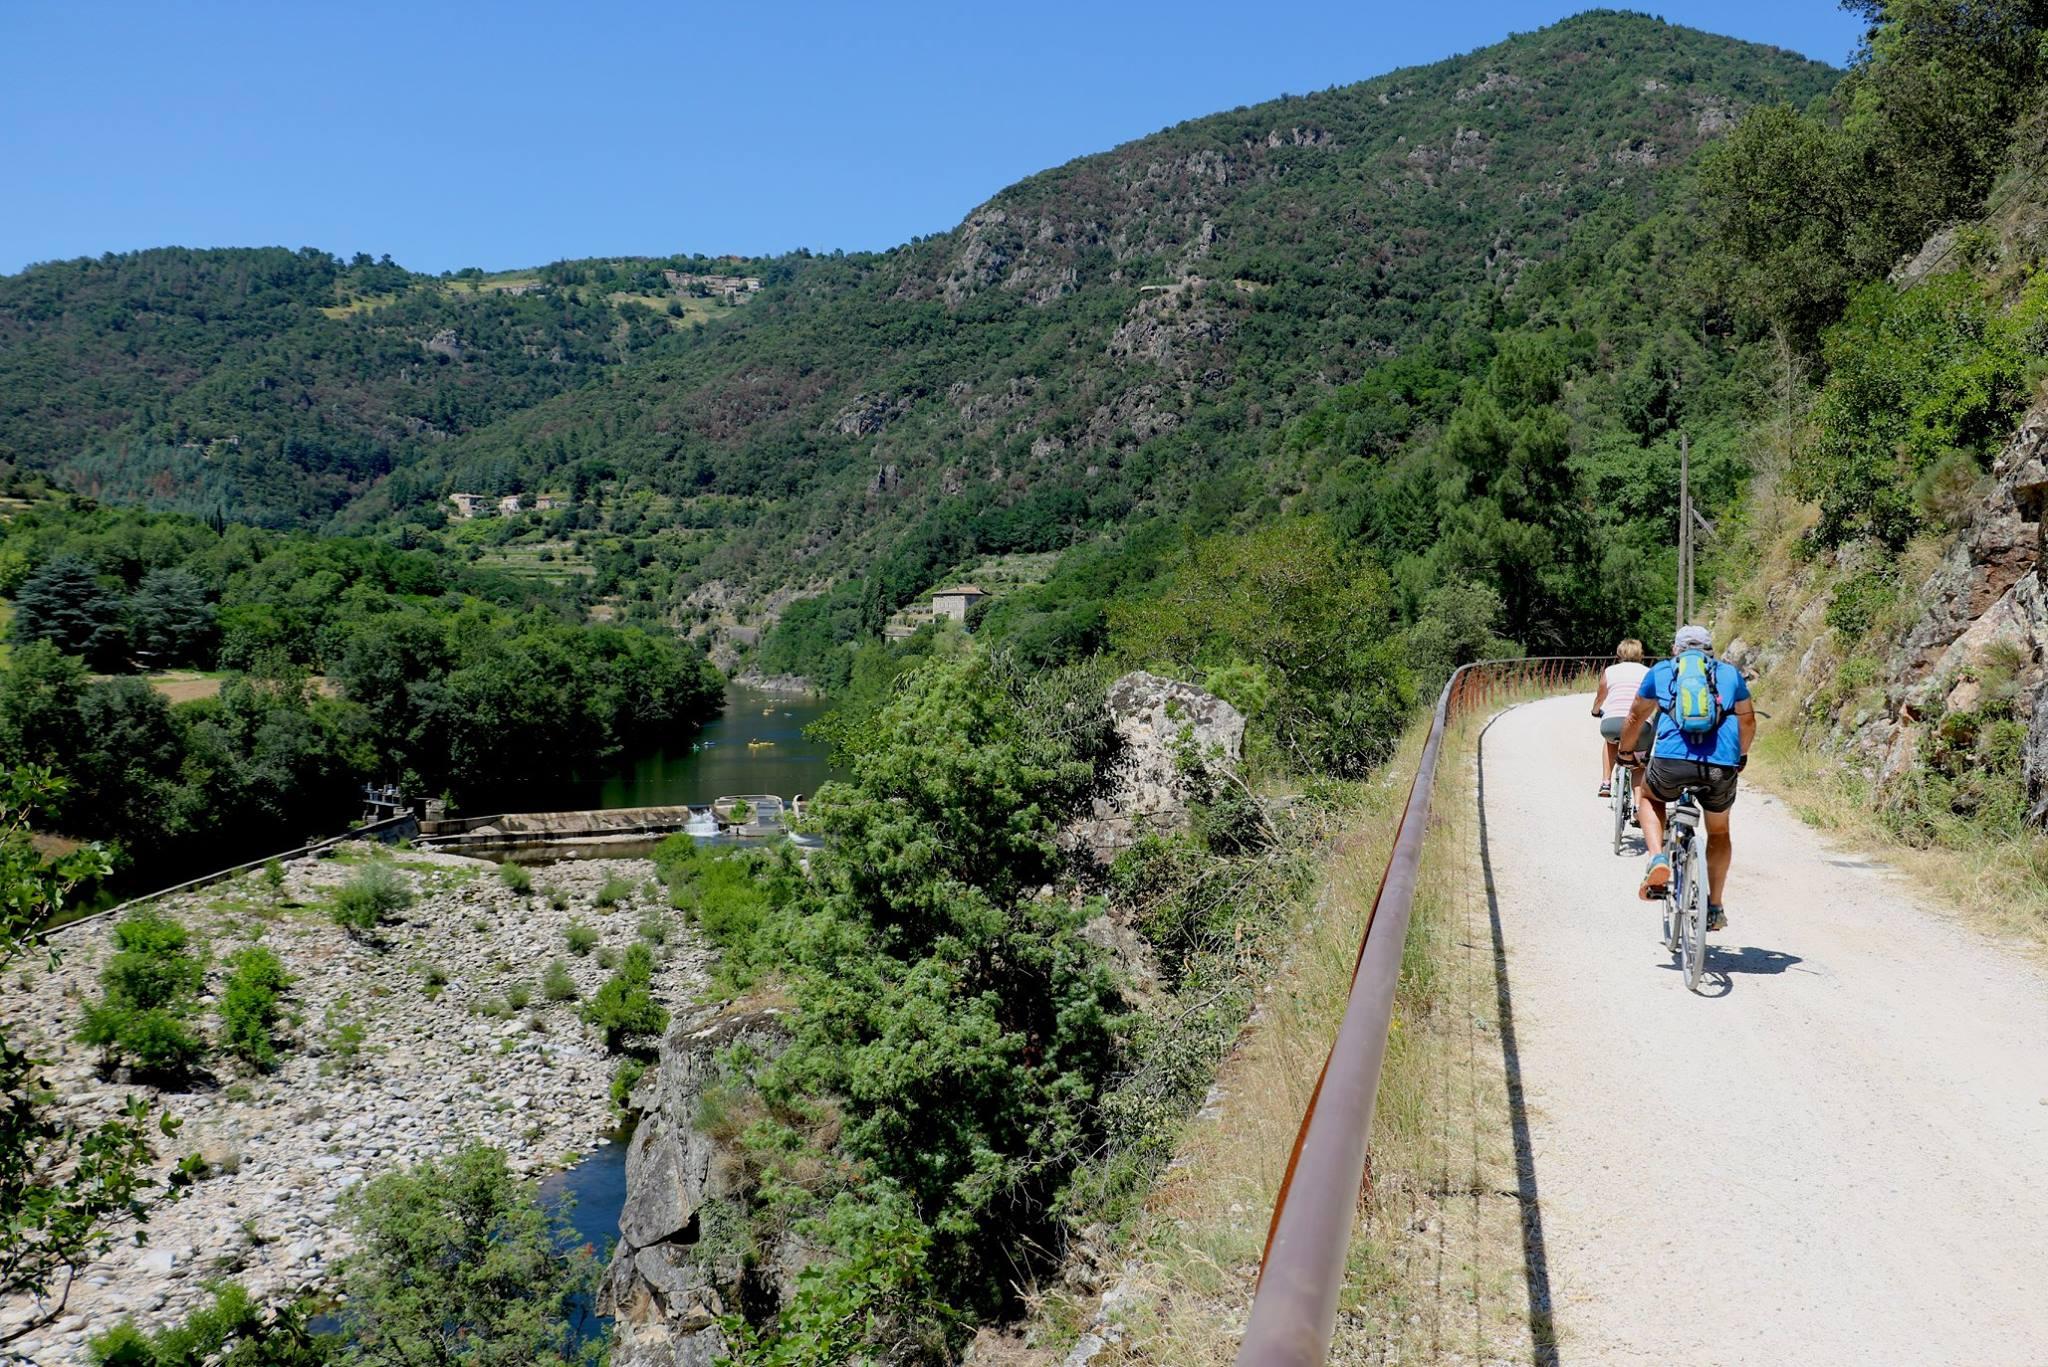 Location de vélos VTT  VTC VAE Ardèche : Location de vélos - Eyrieux Sport